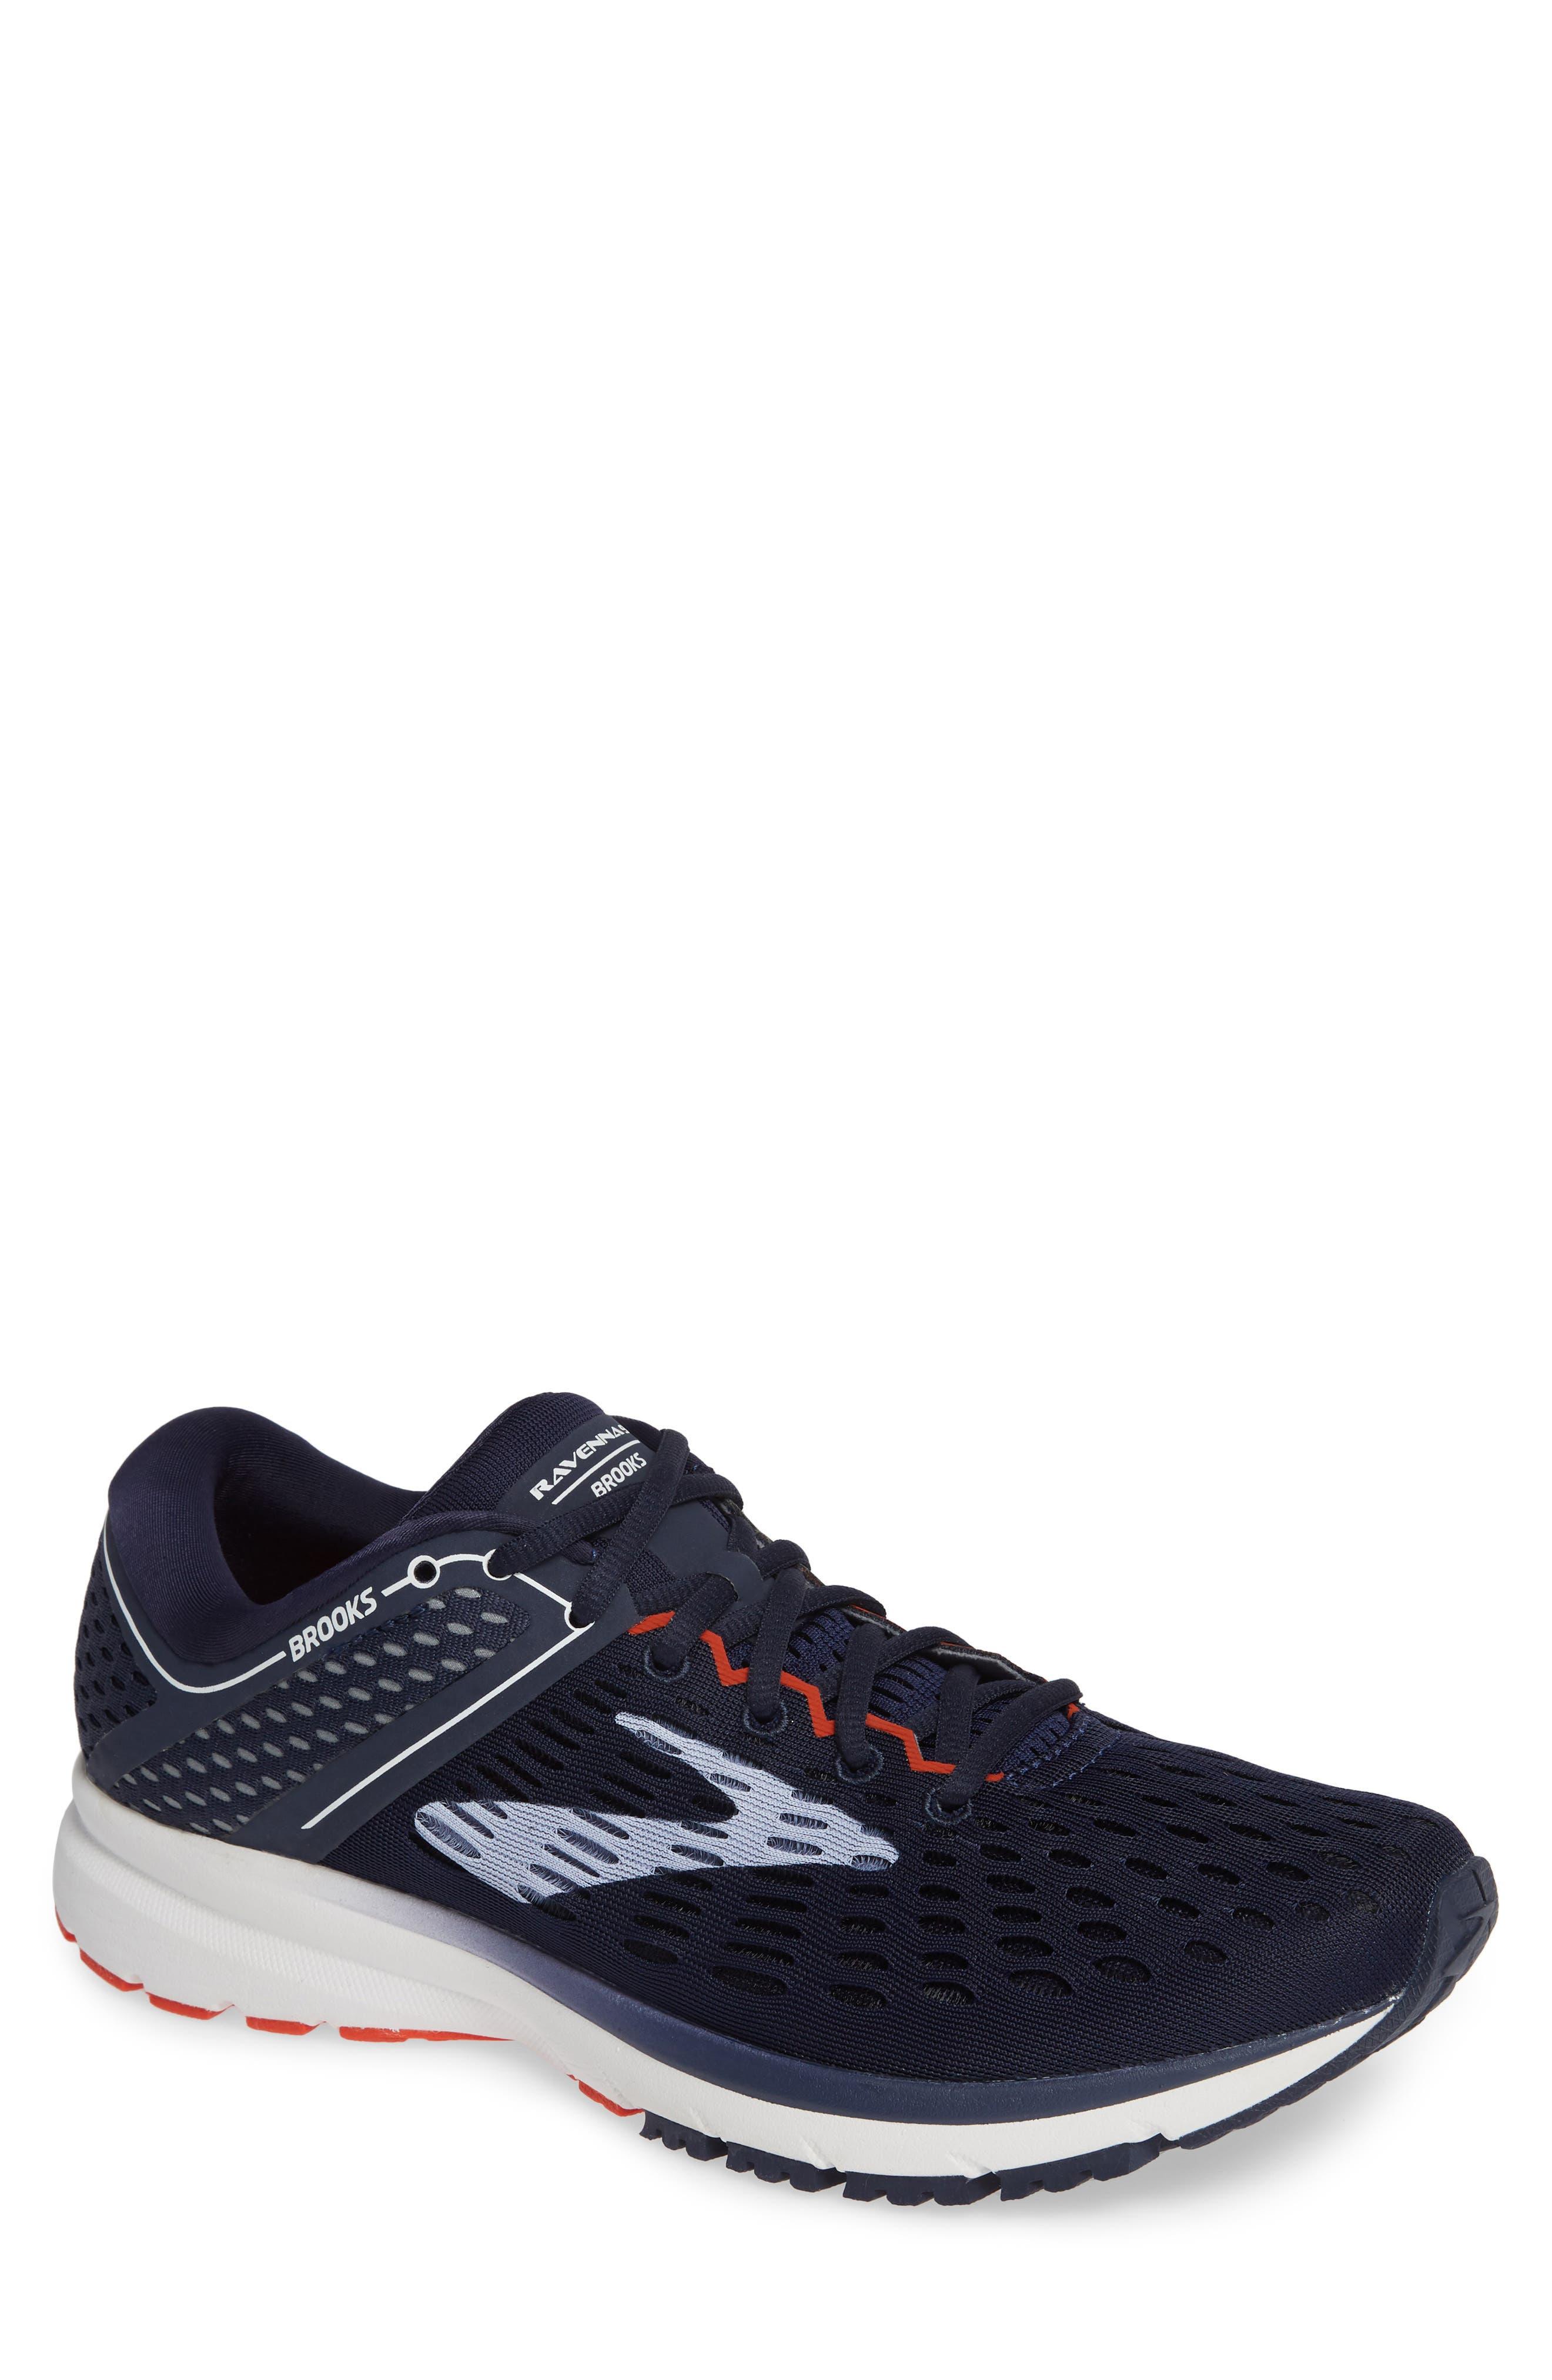 Ravenna 9 Running Shoe,                         Main,                         color, Navy/ White/ Orange